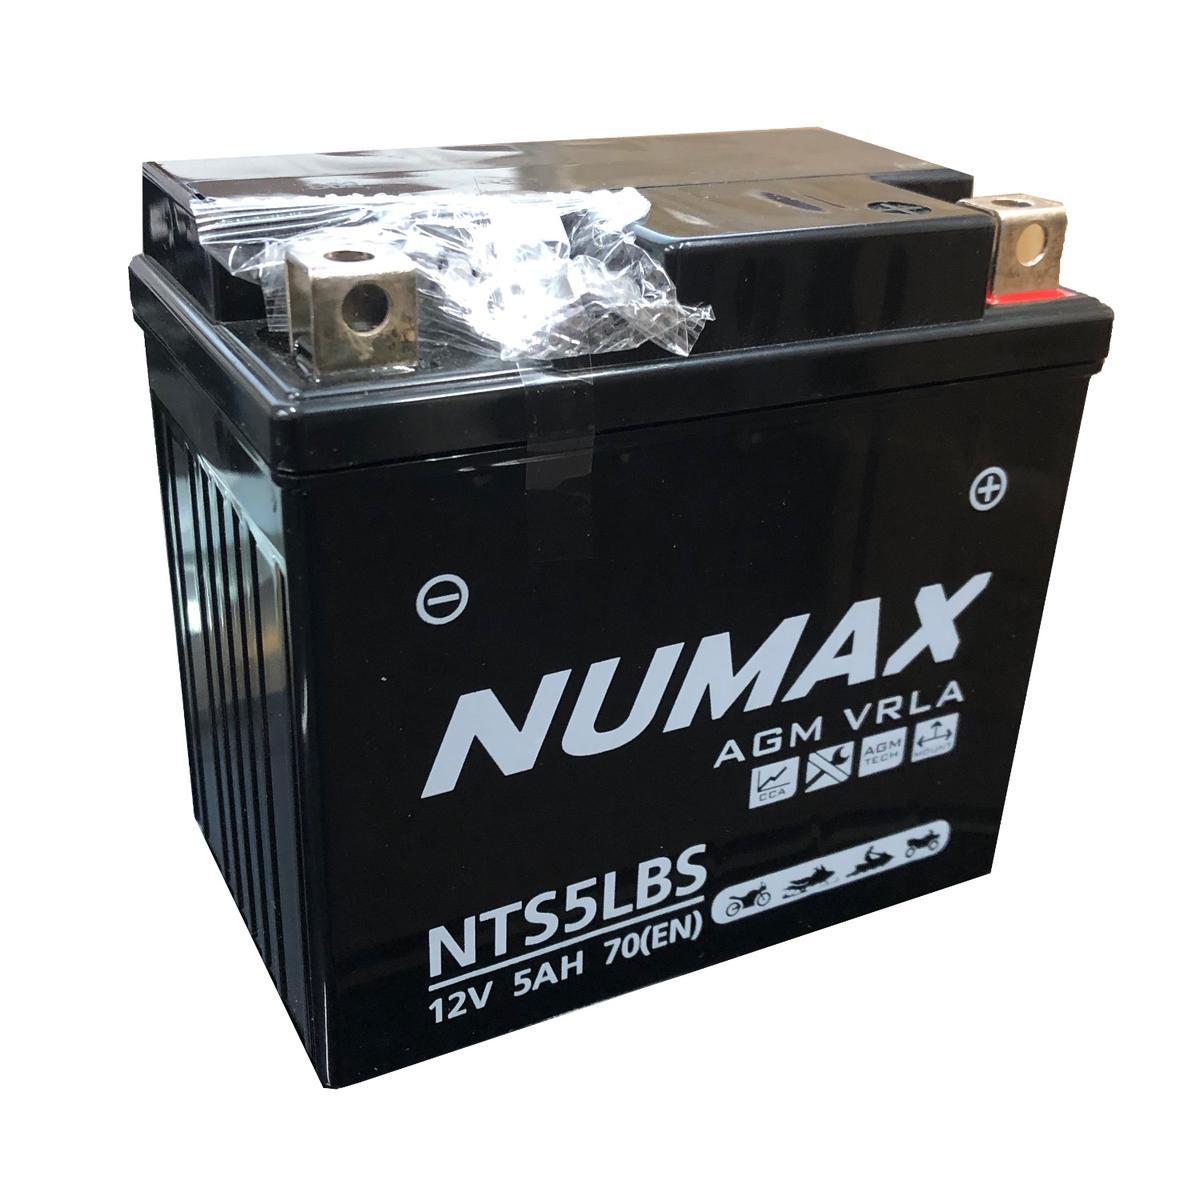 Numax 12v NTS5LBS Motorbike Bike Battery YAMAHA 50cc Zuma YTX5L-4